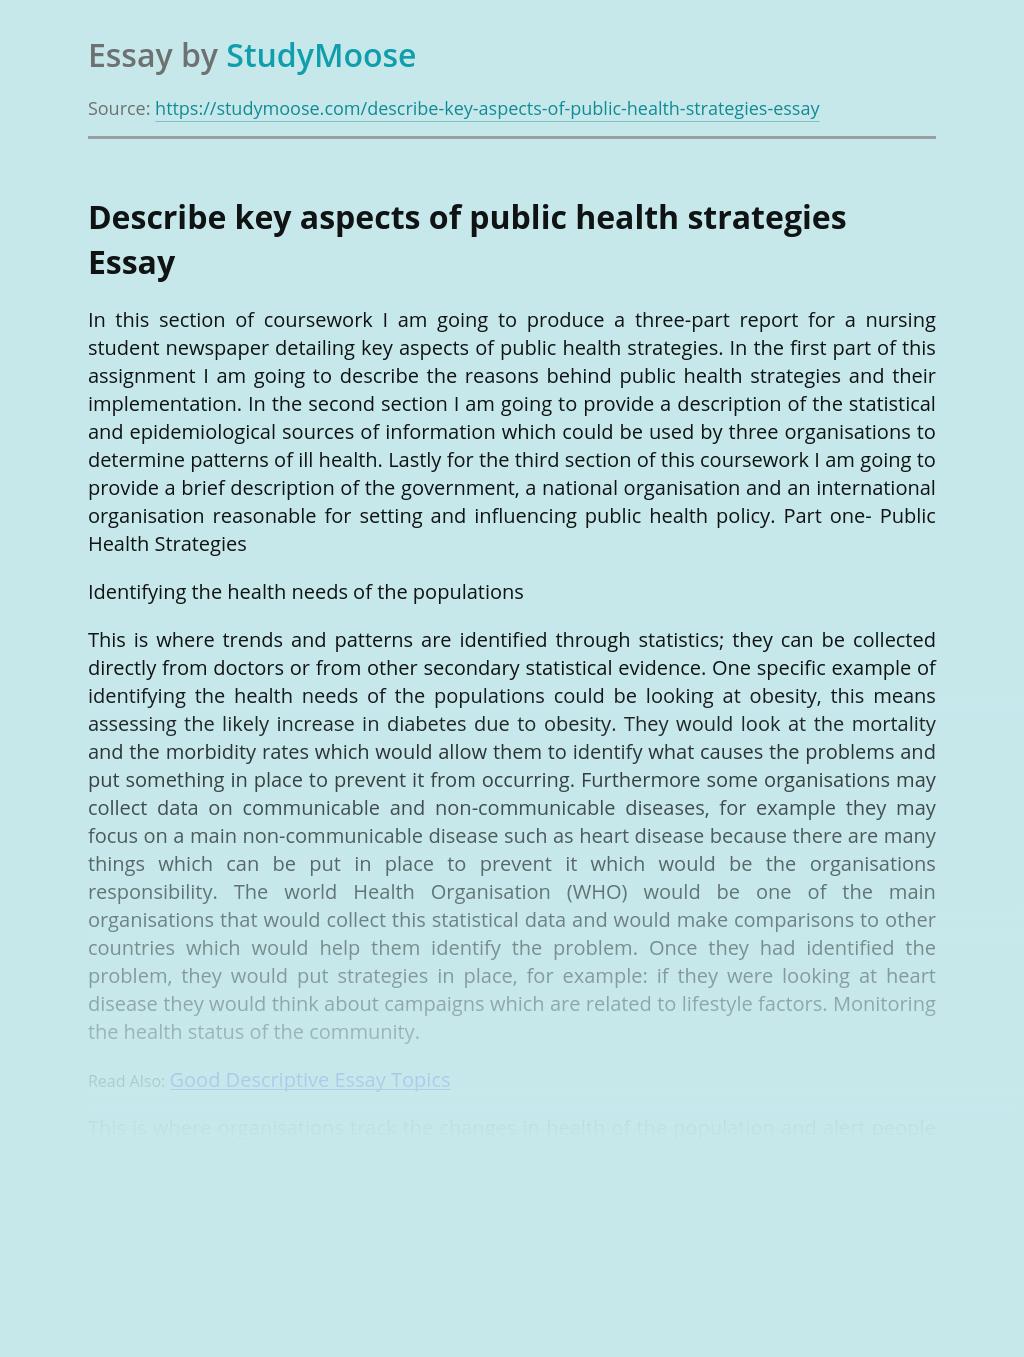 Describe key aspects of public health strategies